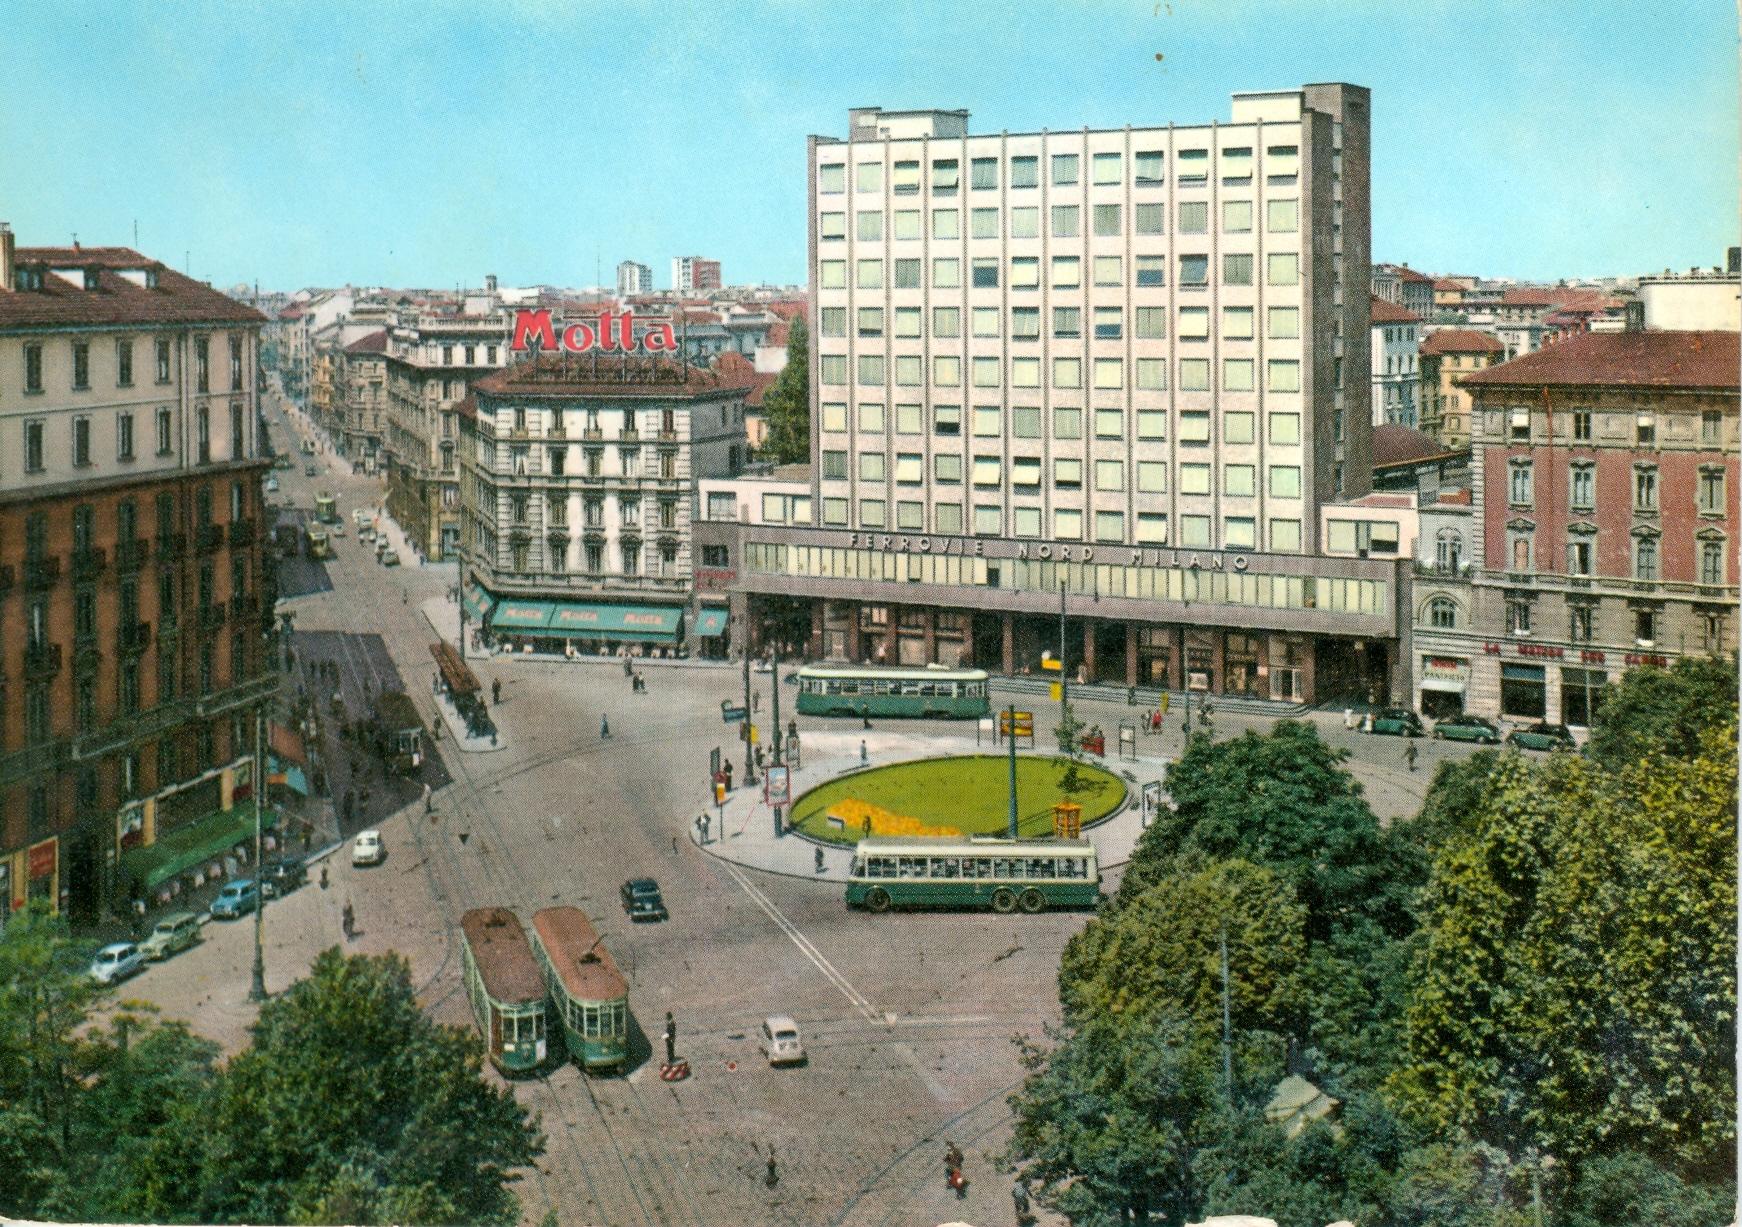 milano cadorna railway station